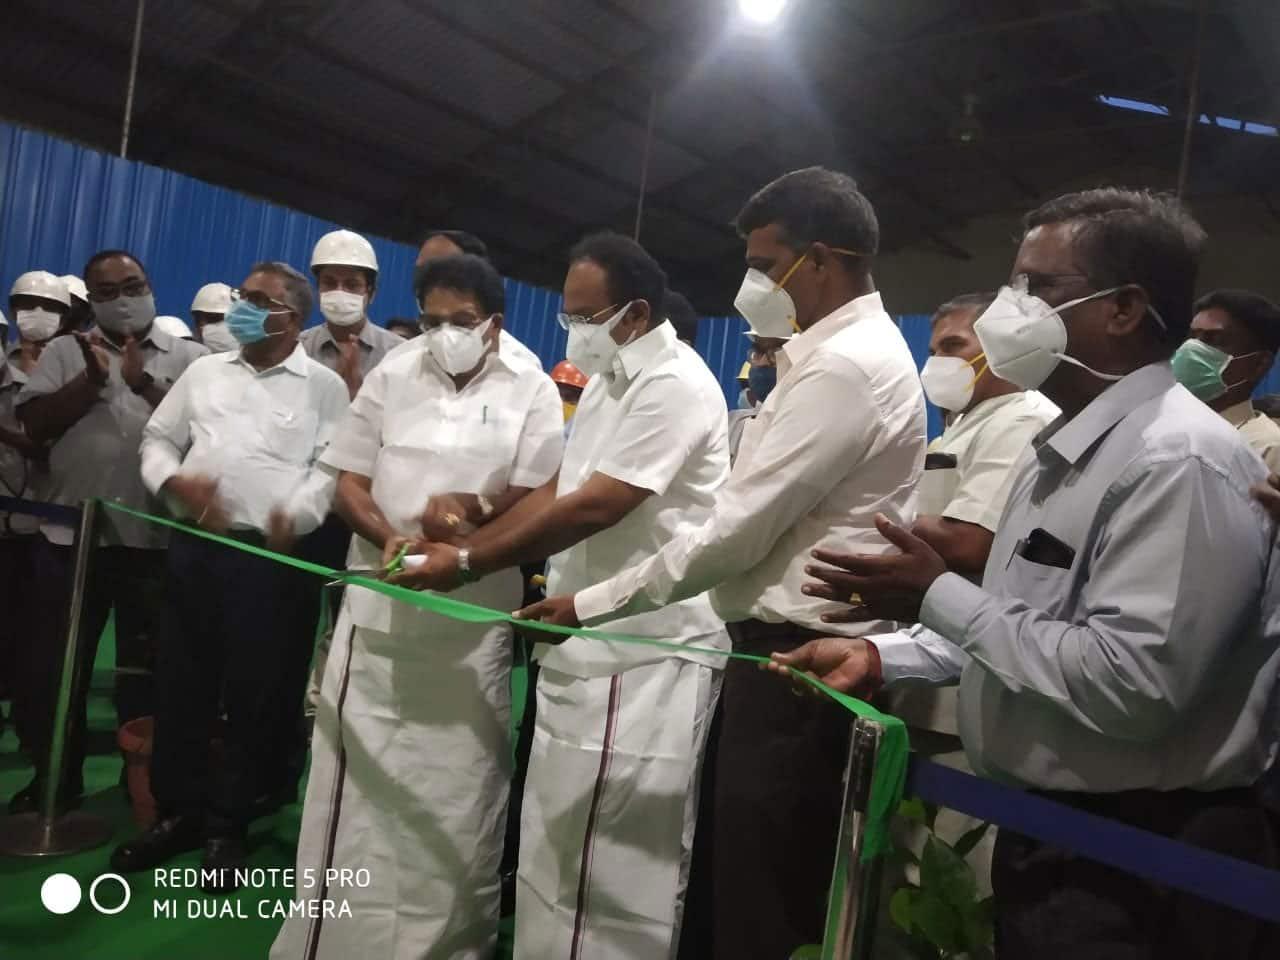 oxygen production plant in Virudhunagar